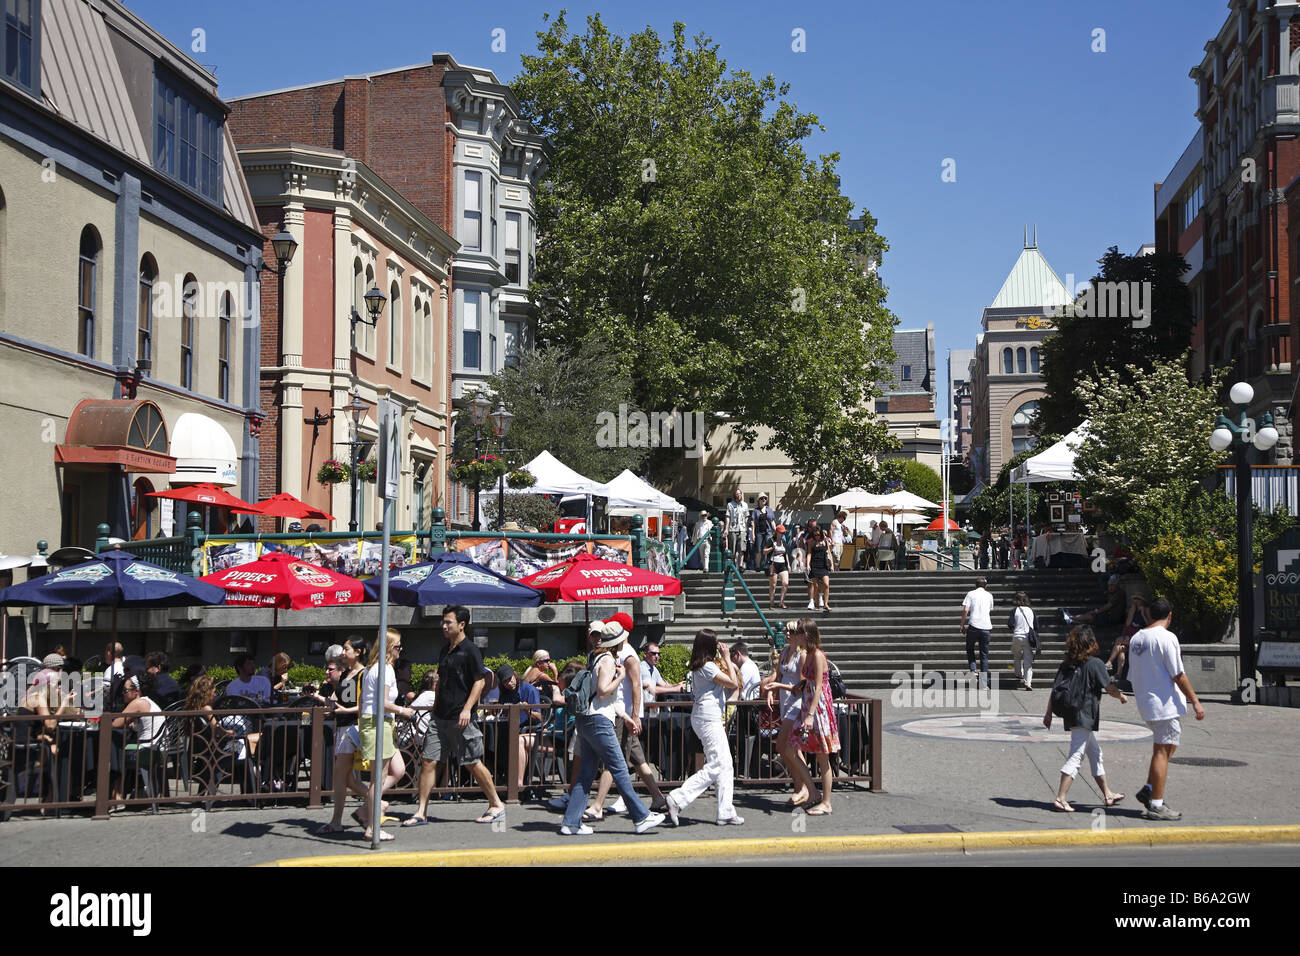 Canada Kanada BC Britisch British Columbia Vancouver Island Victoria Bastion Square Wharf Street - Stock Image